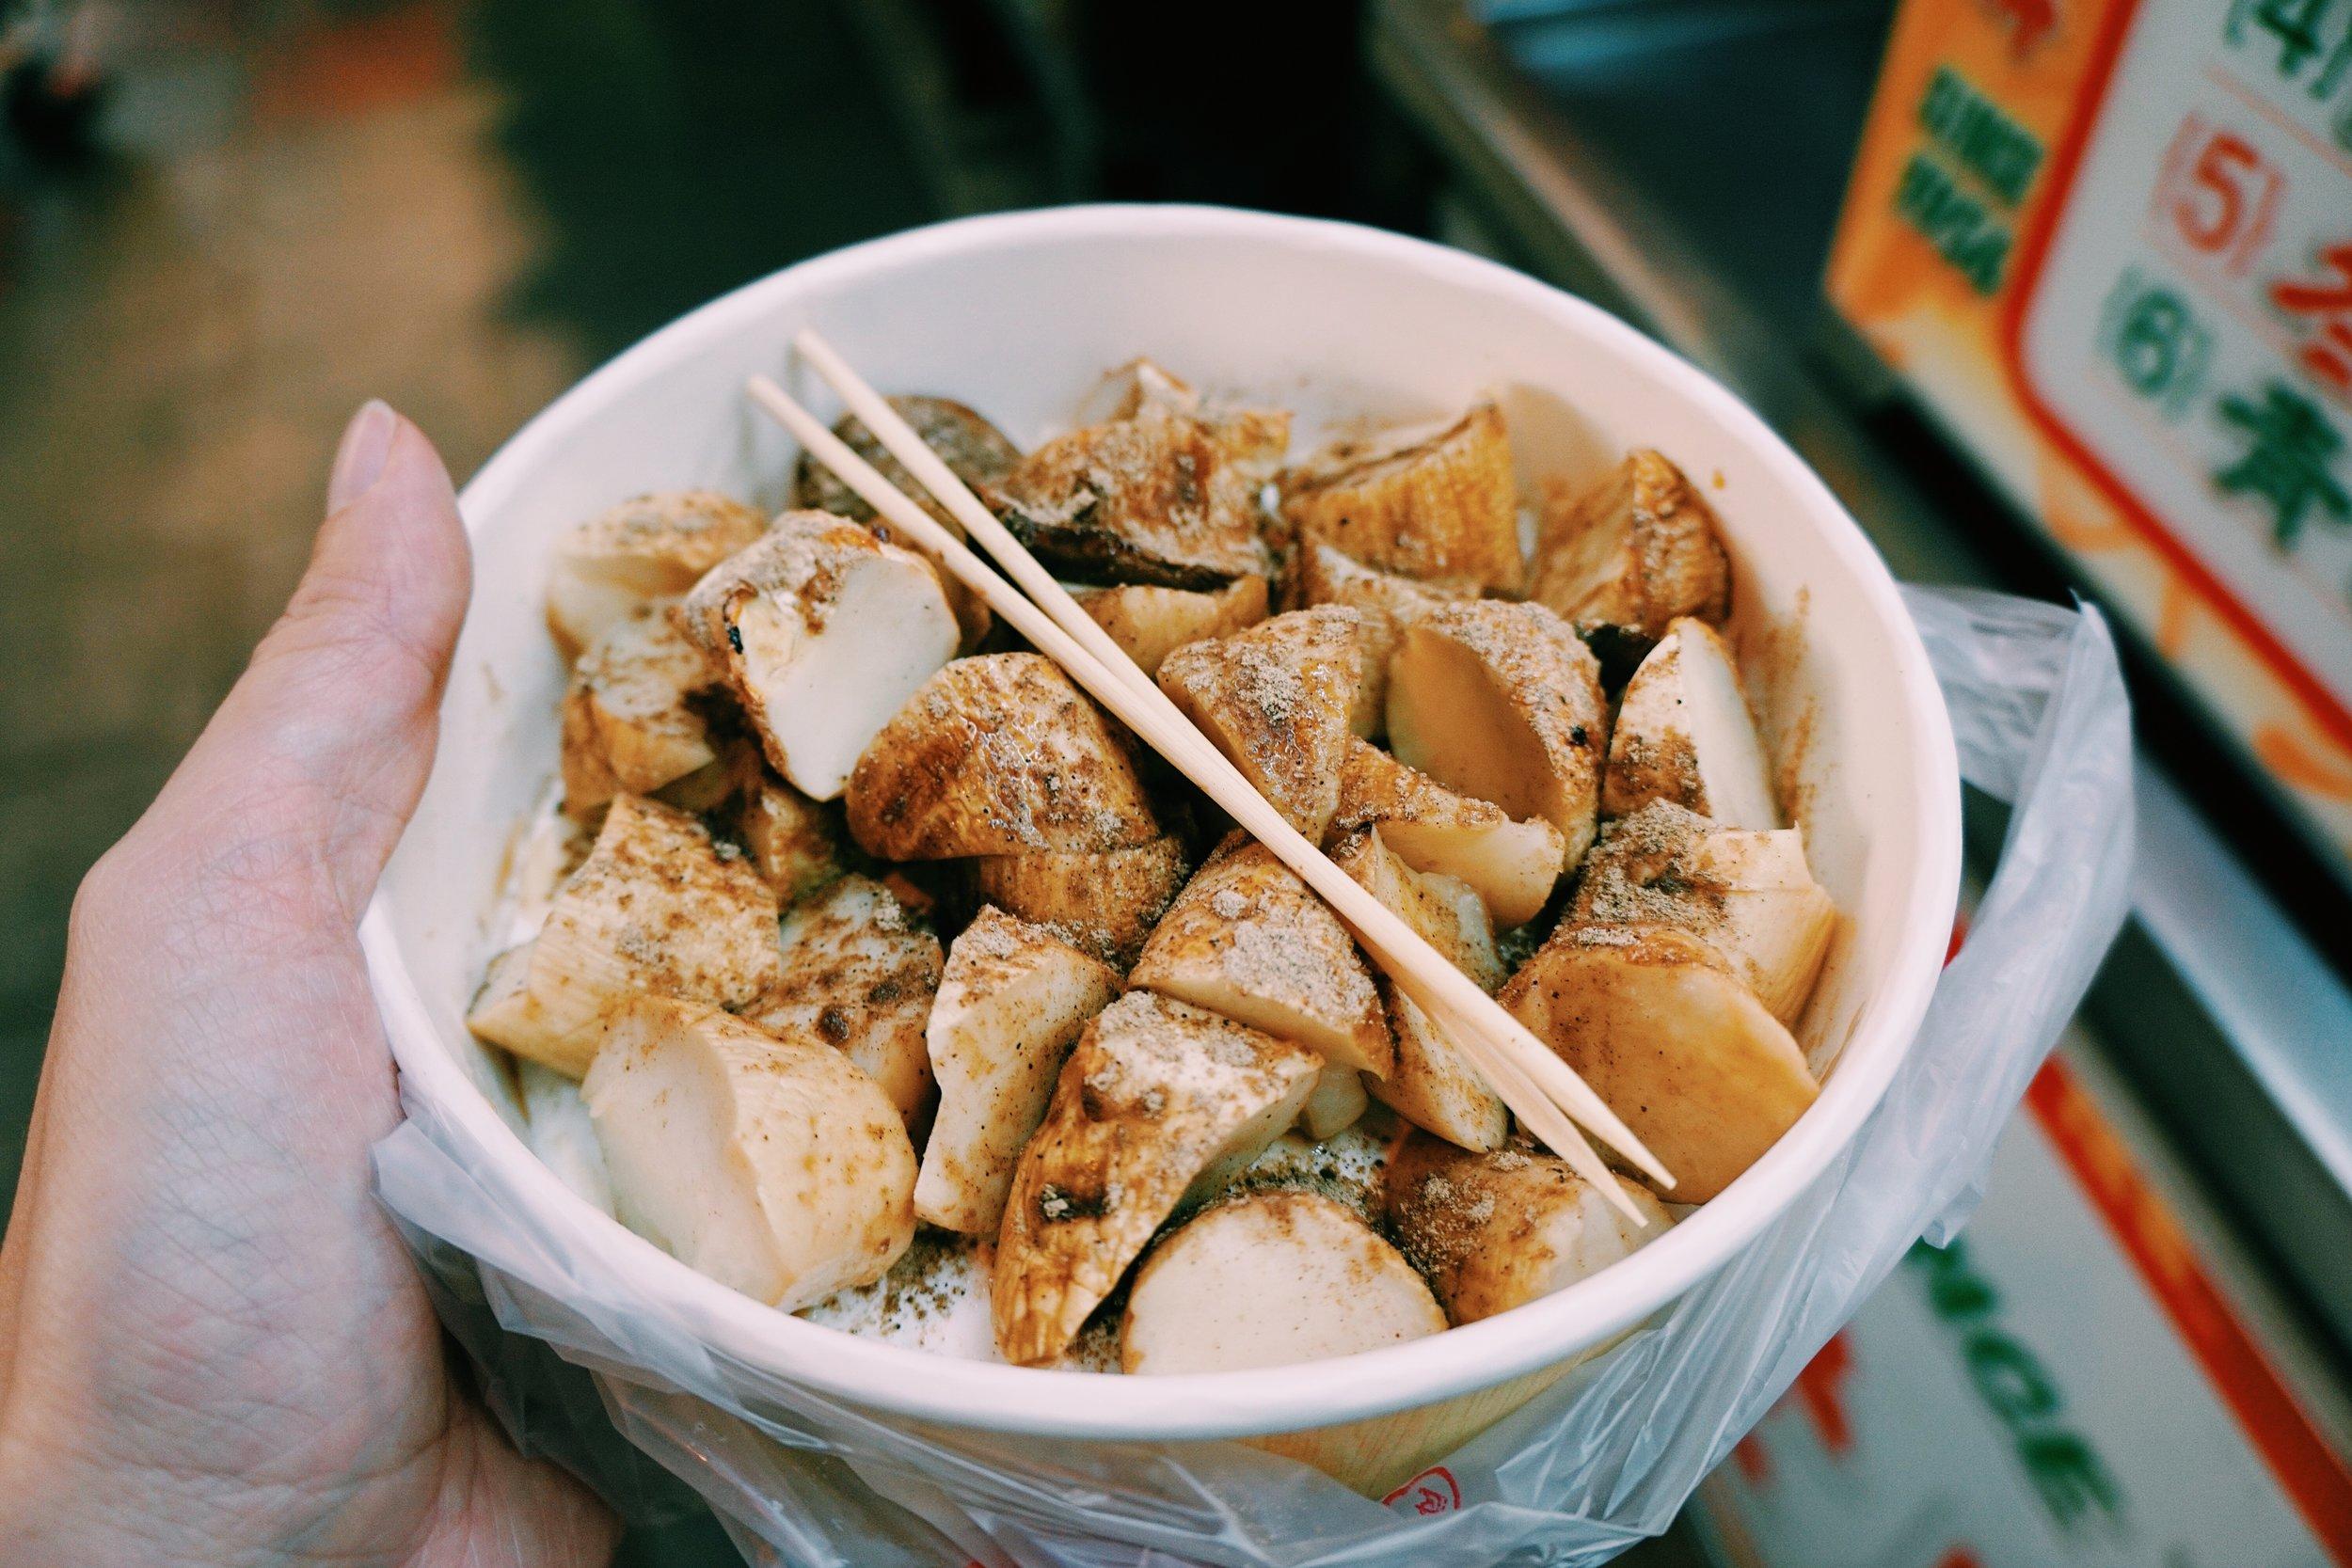 king-mushrooms-taiwan-night-market.jpg